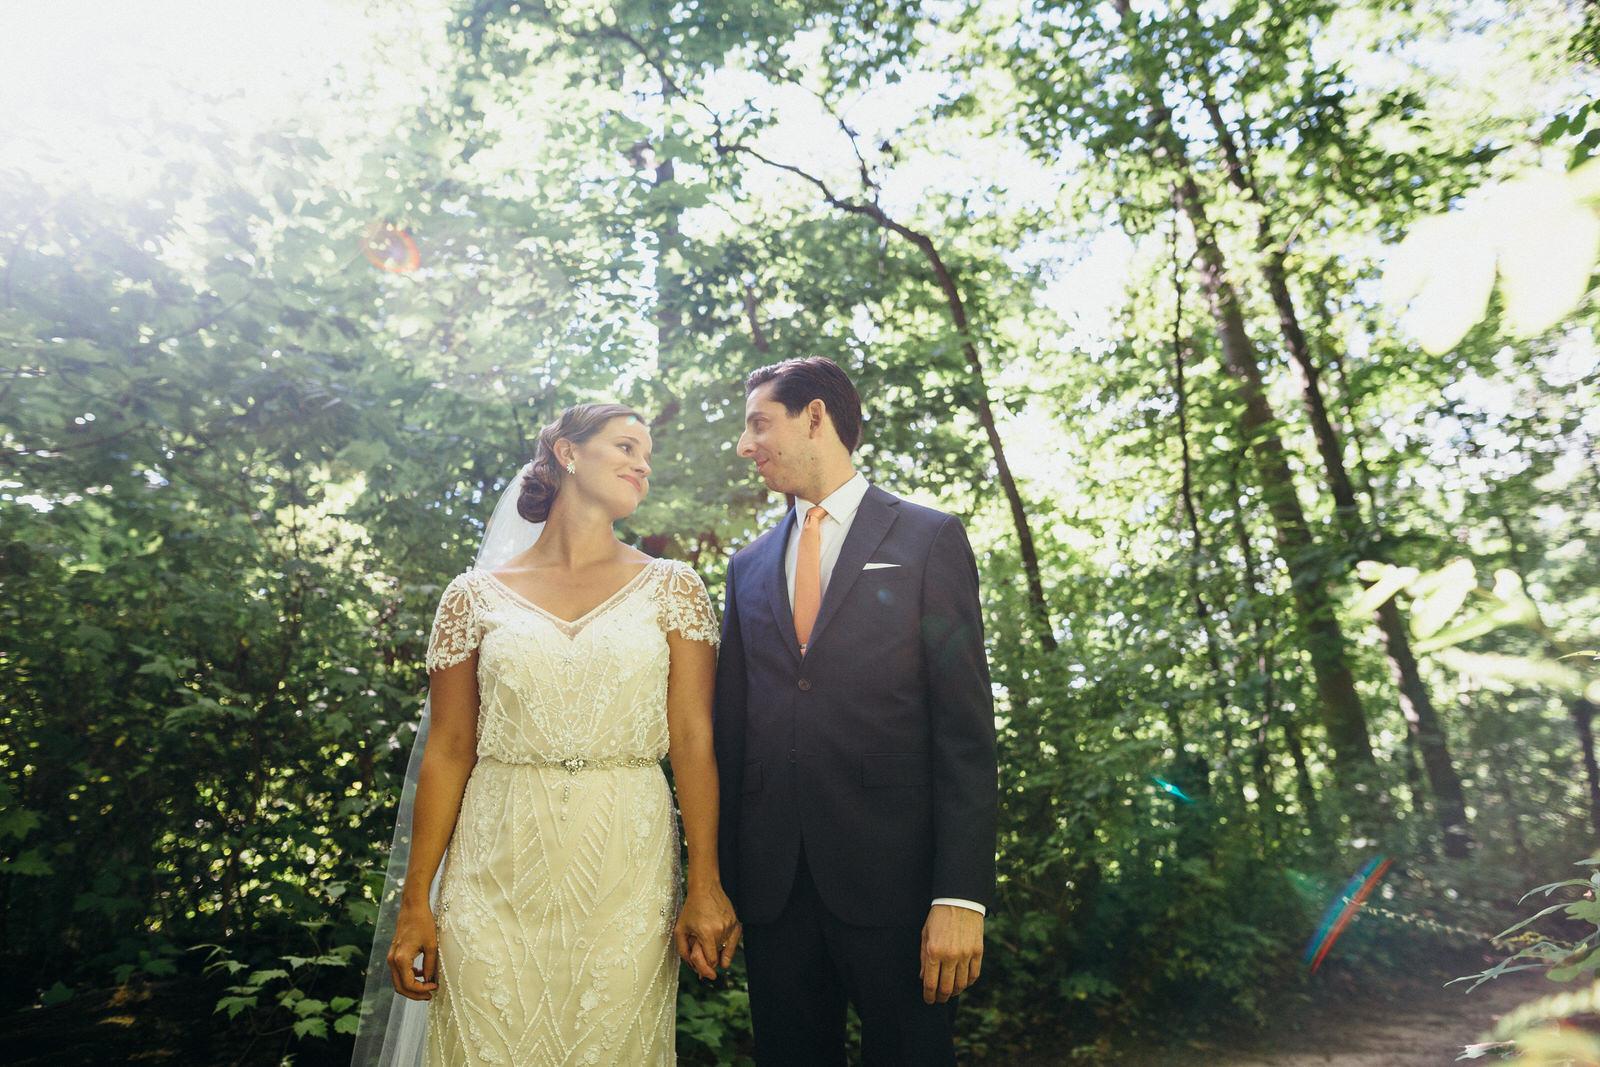 Portland Oregon Wedding Photographer Union pier Michigan wedding0026 .JPG